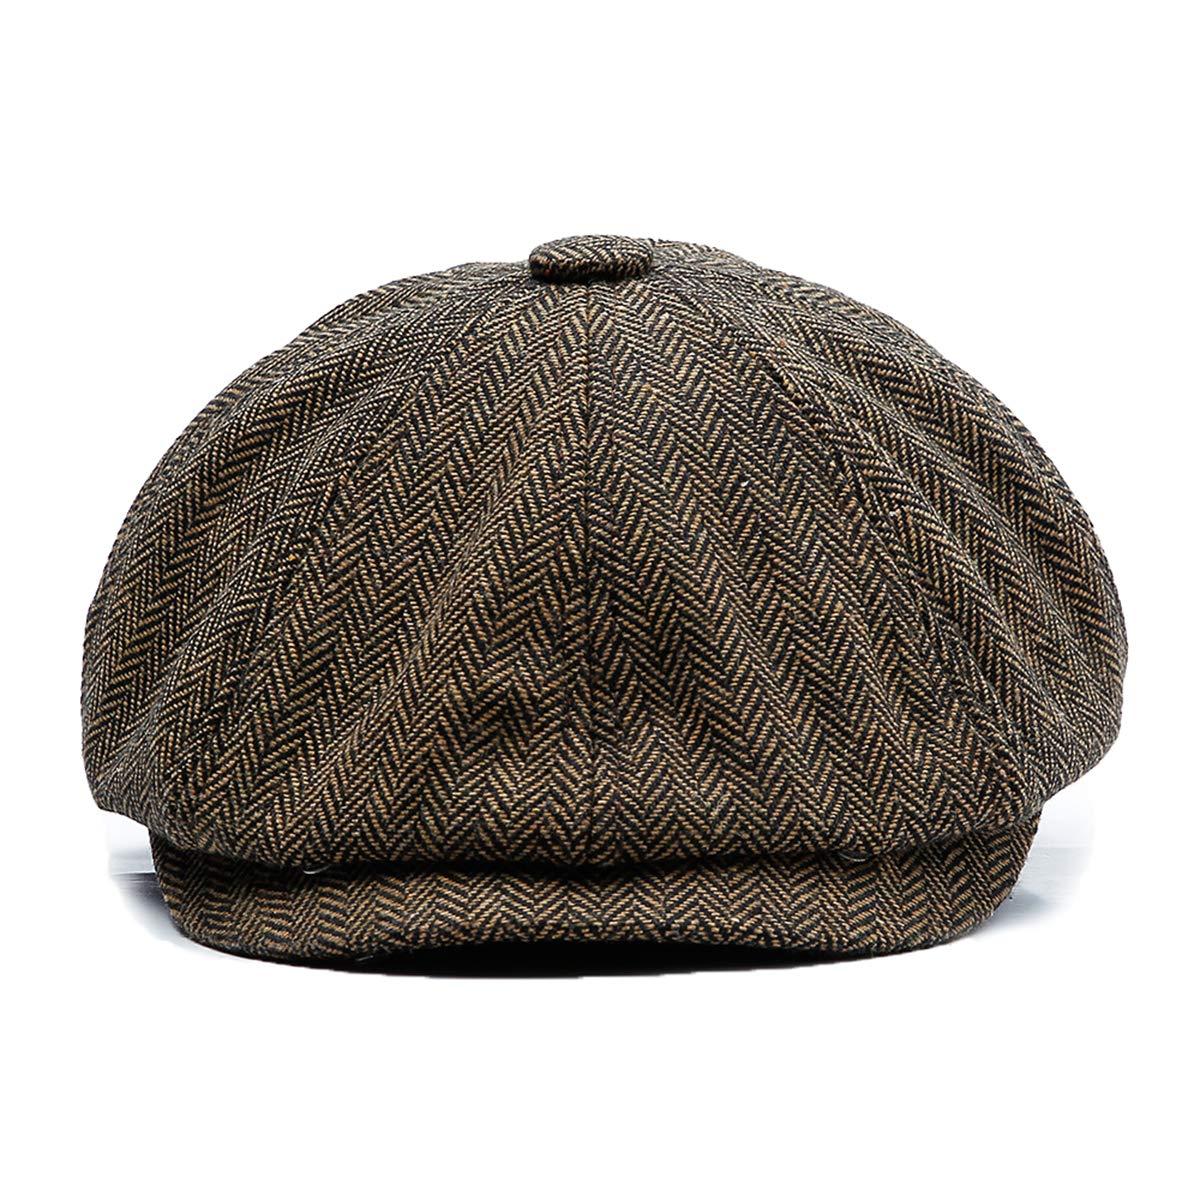 KeepSa Newsboy Cap Baker Boy Hat Flat Caps - 8 Panel Peaky Herringbone Tweed Gatsby Hat Ivy Irish Cap for Men and Women